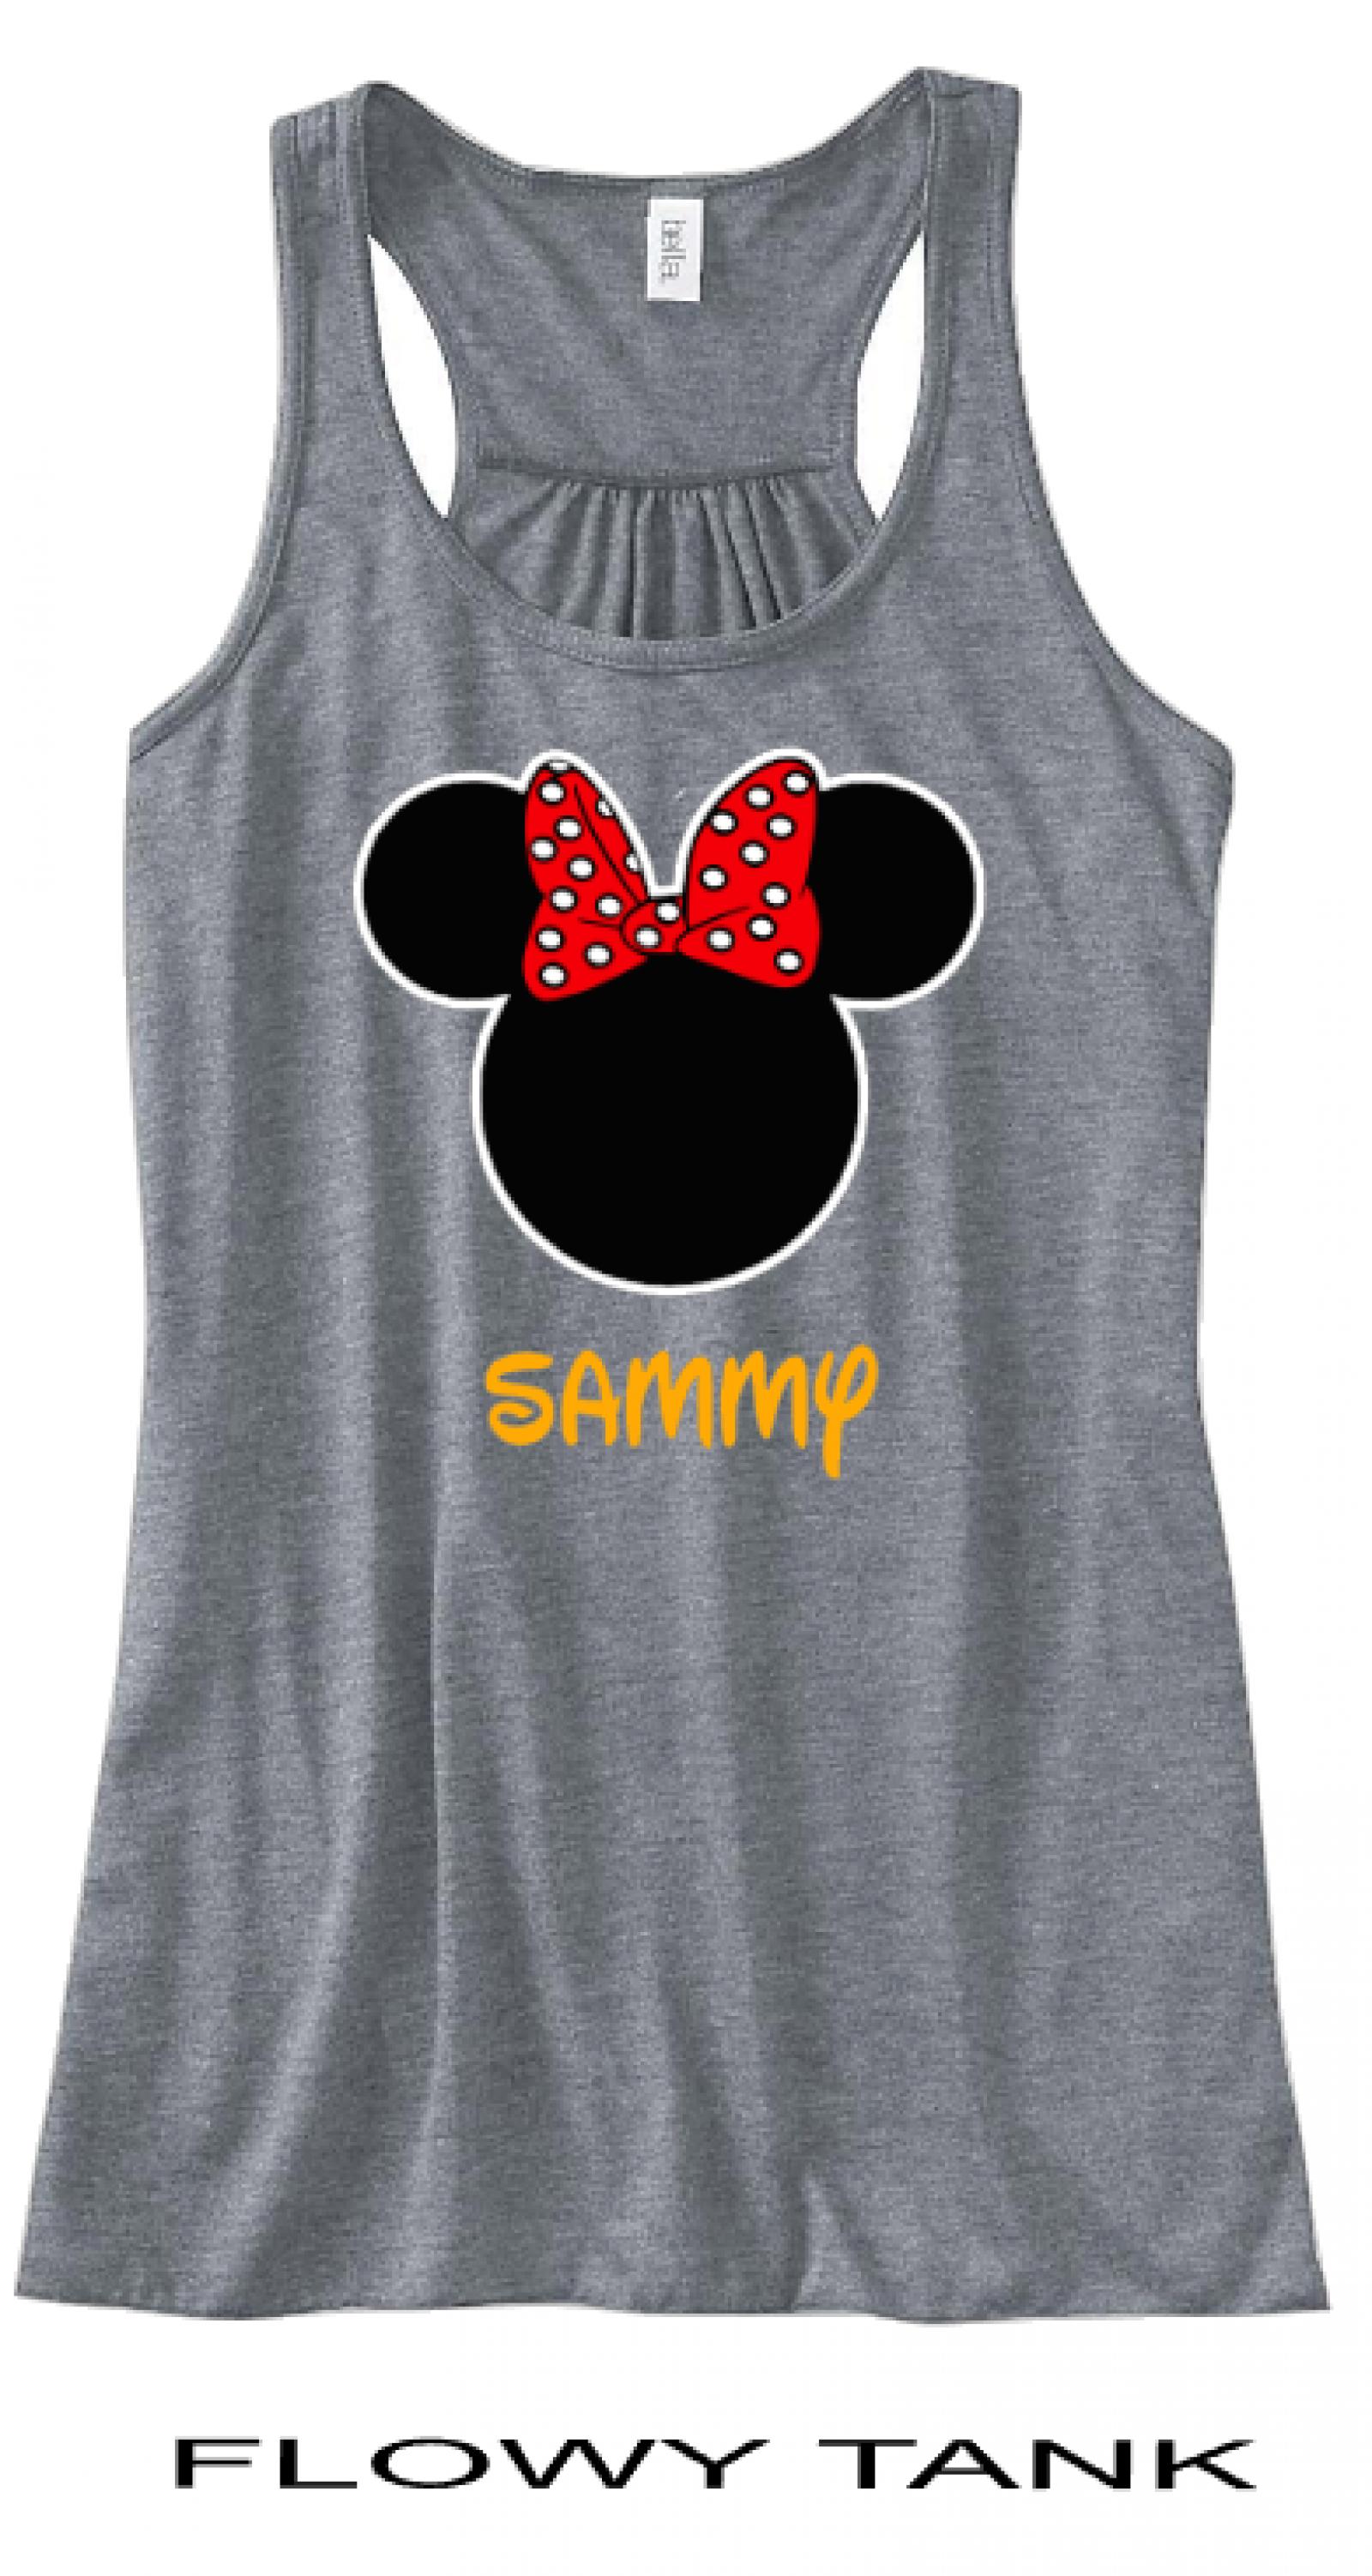 Minnie Mouse Tank Top Disney Family Vacation Trip T-Shirt Disney Shirt Minnie Mouse Inspired Black Red White Polka Dot Disney Dress